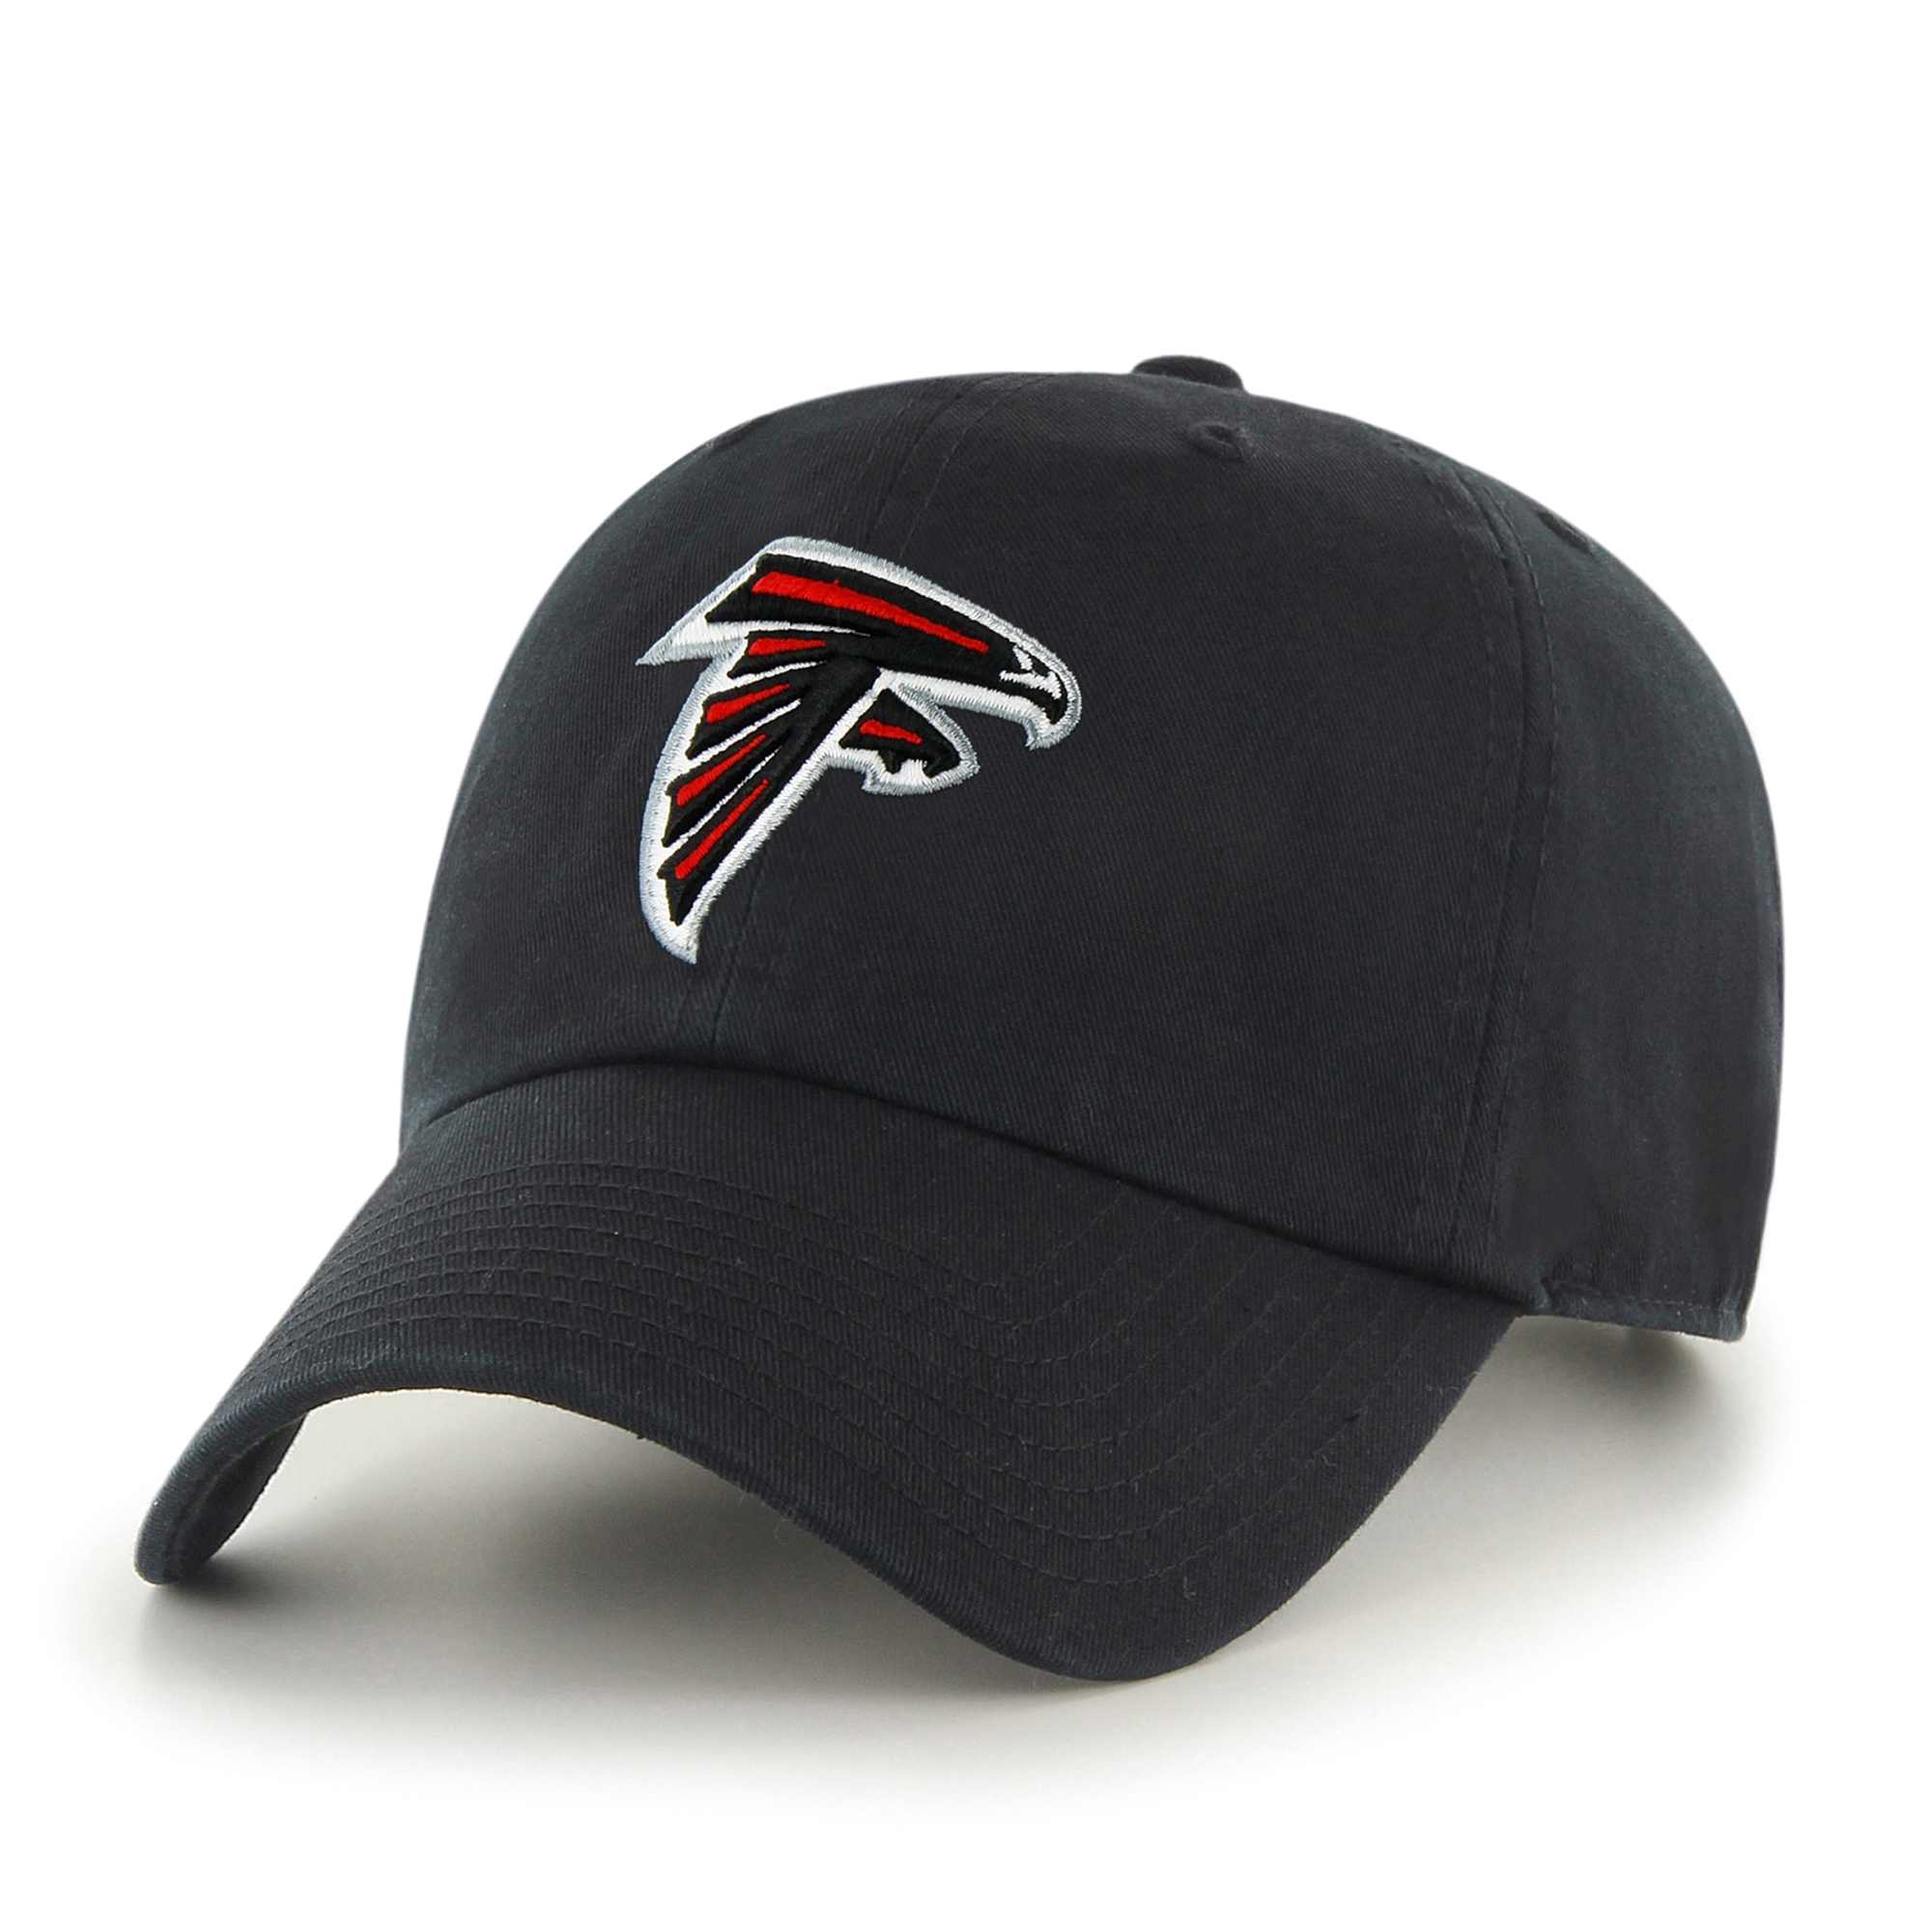 NFL Atlanta Falcons Clean Up Adjustable Cap/Hat by Fan Favorite